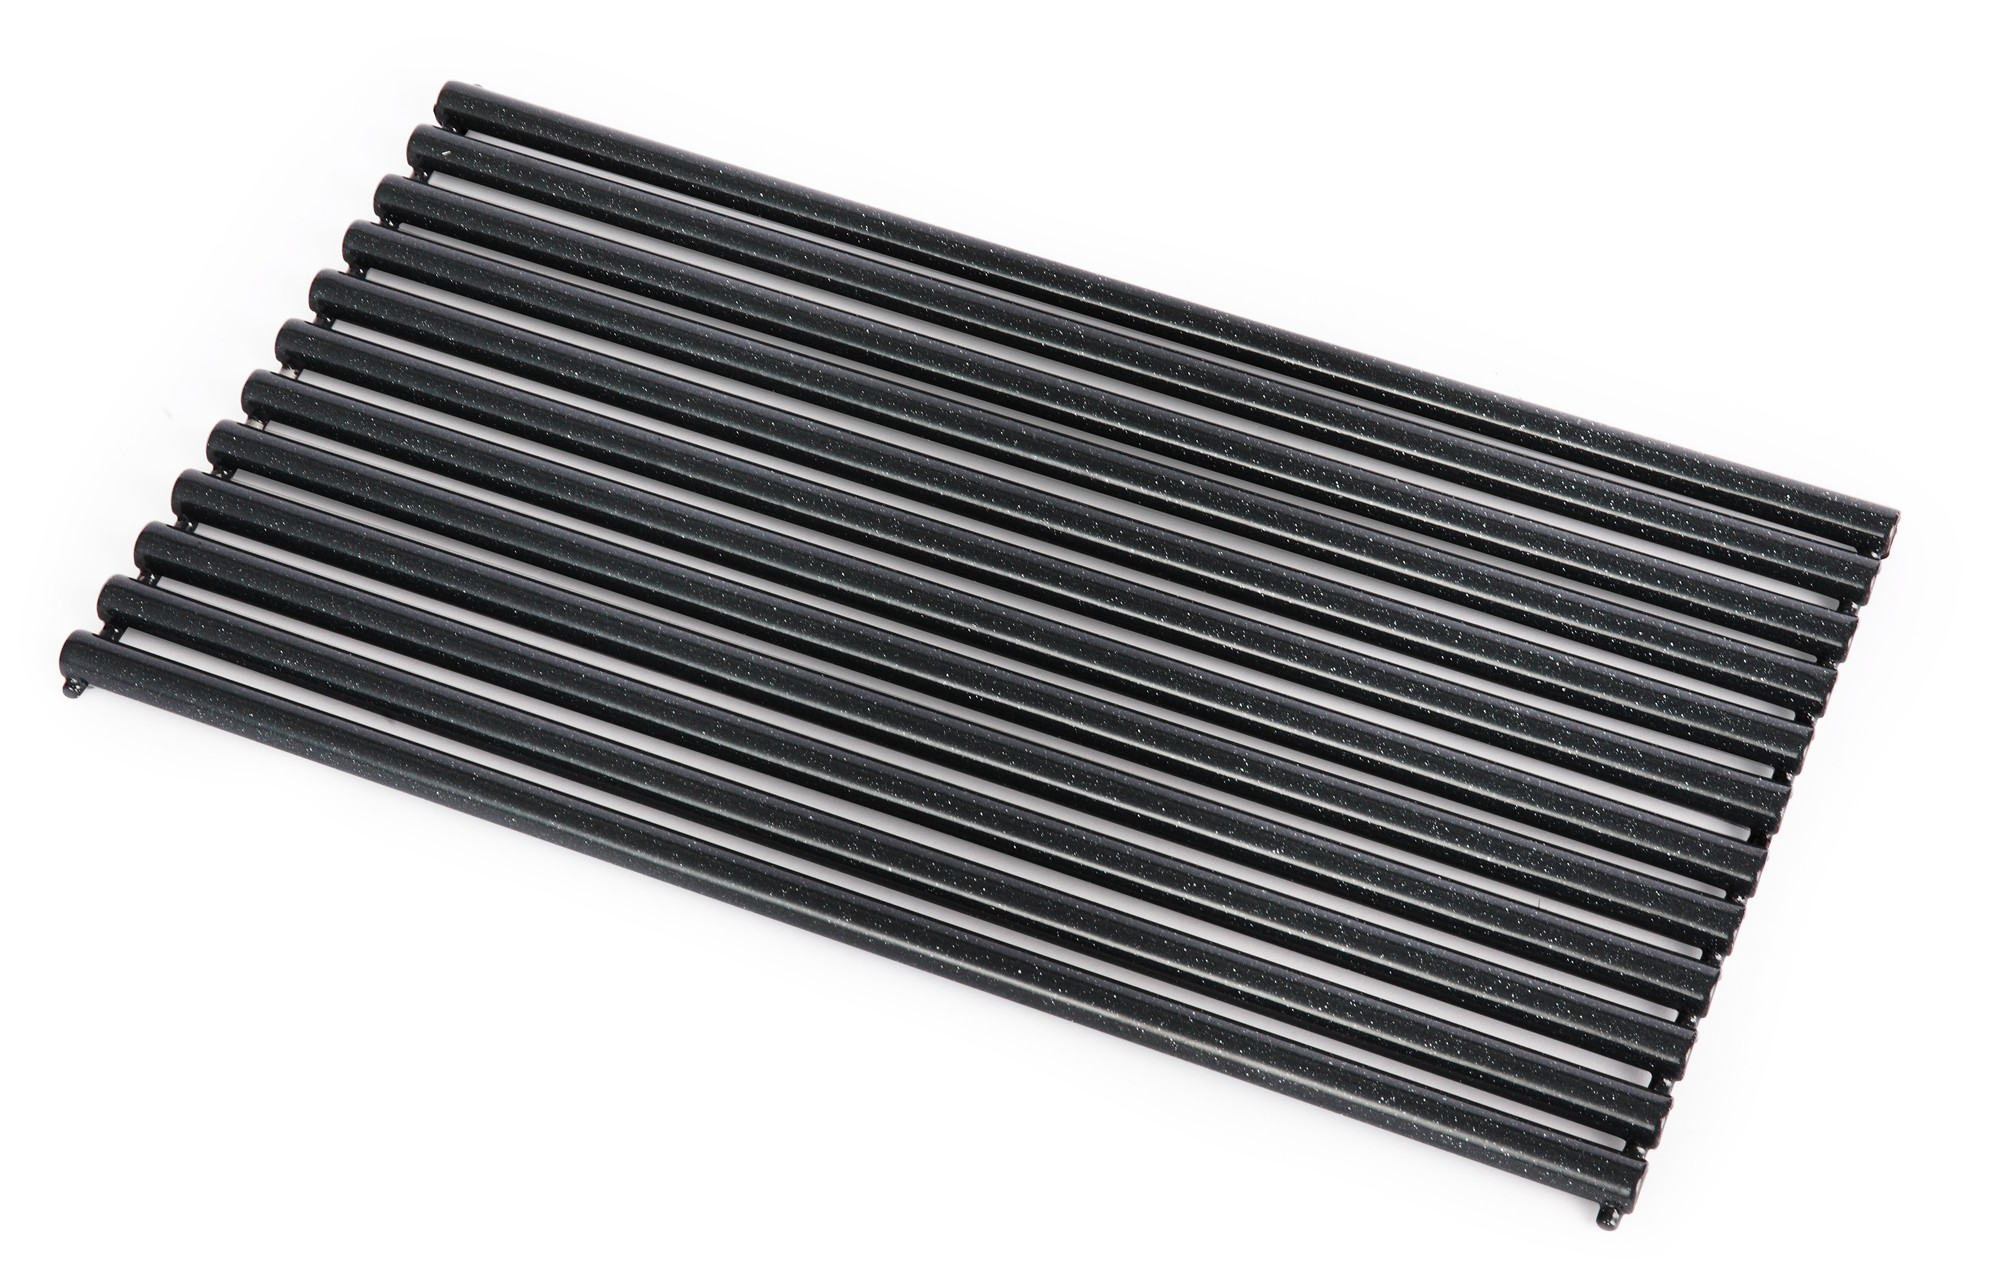 CADAC Grillrost / Thermogrid small 19,5 x 42 cm Bild 1